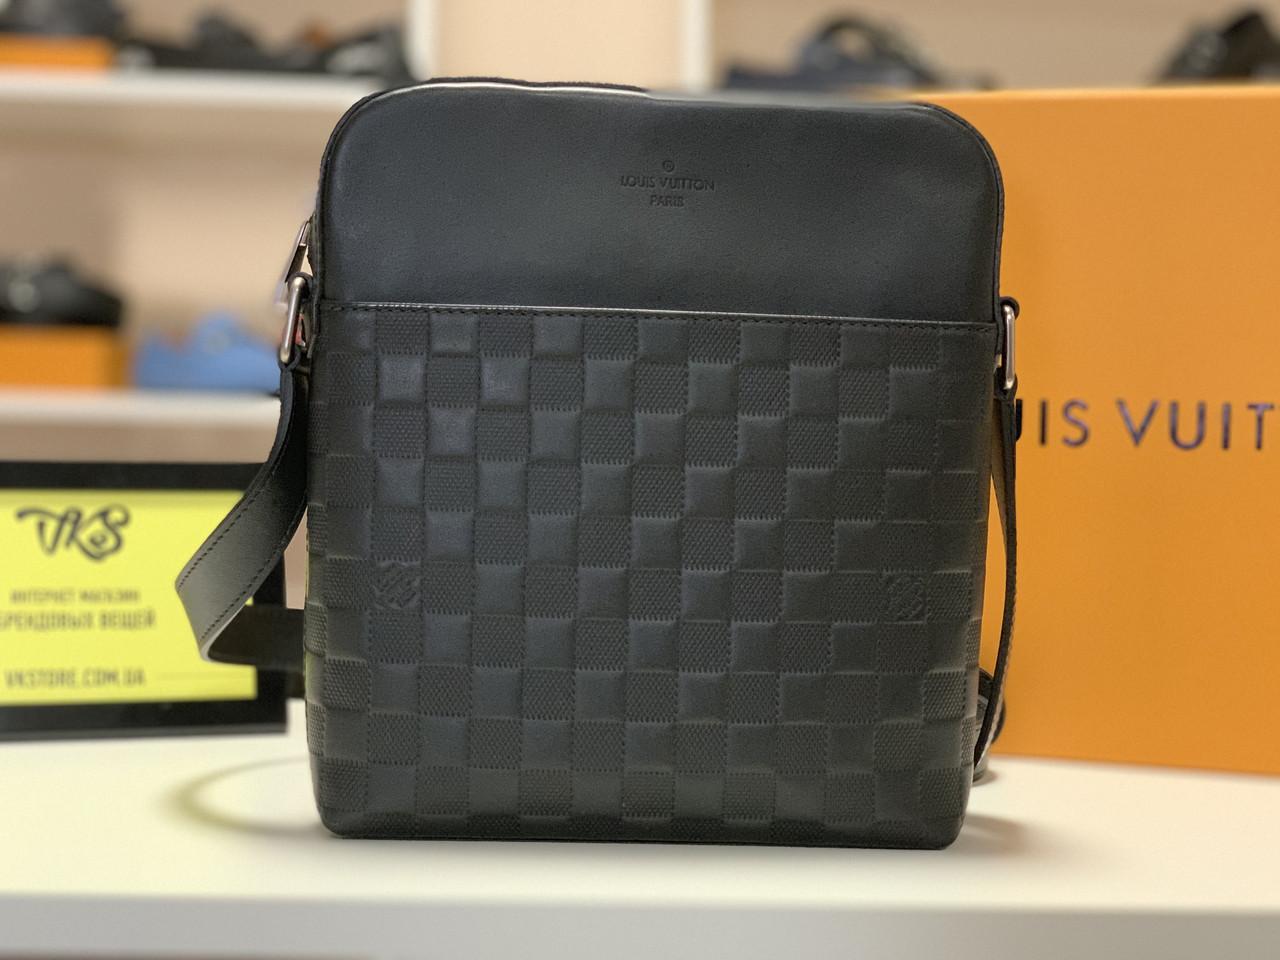 12c23228dfc2 Мужская сумка Louis Vuitton District Pochette, цена 7 900 грн ...